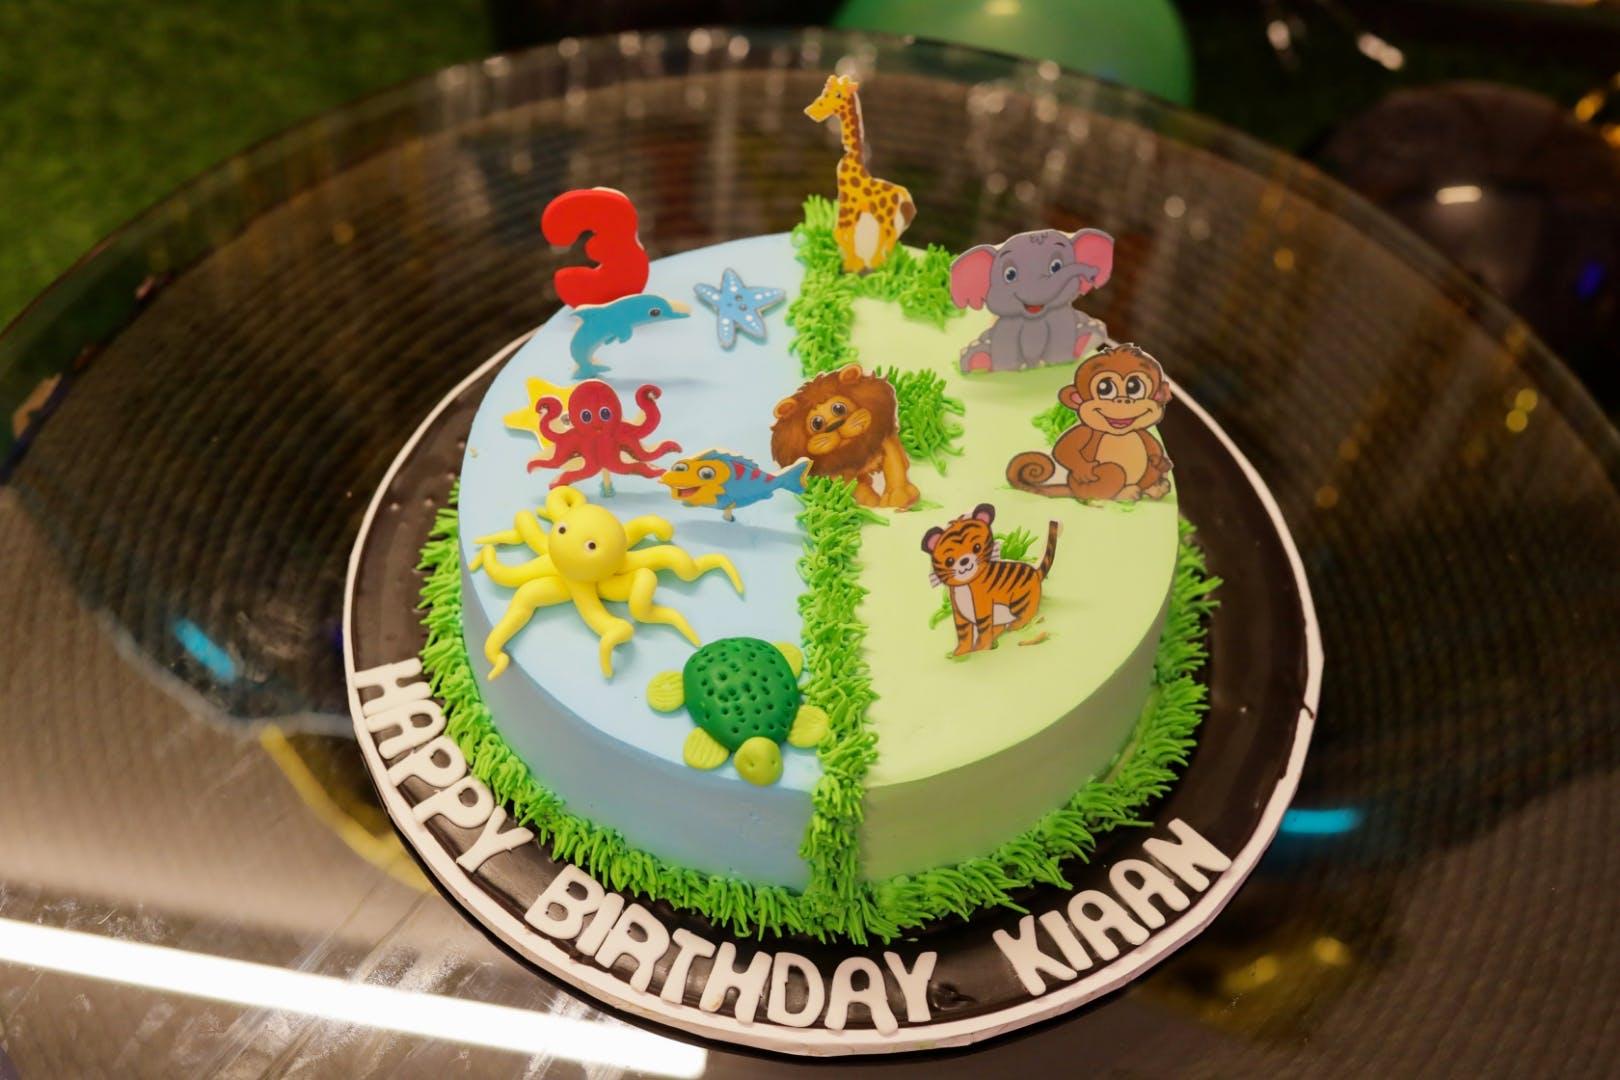 Cake,Cake decorating,Sugar paste,Fondant,Buttercream,Icing,Pasteles,Birthday cake,Torte,Cake decorating supply